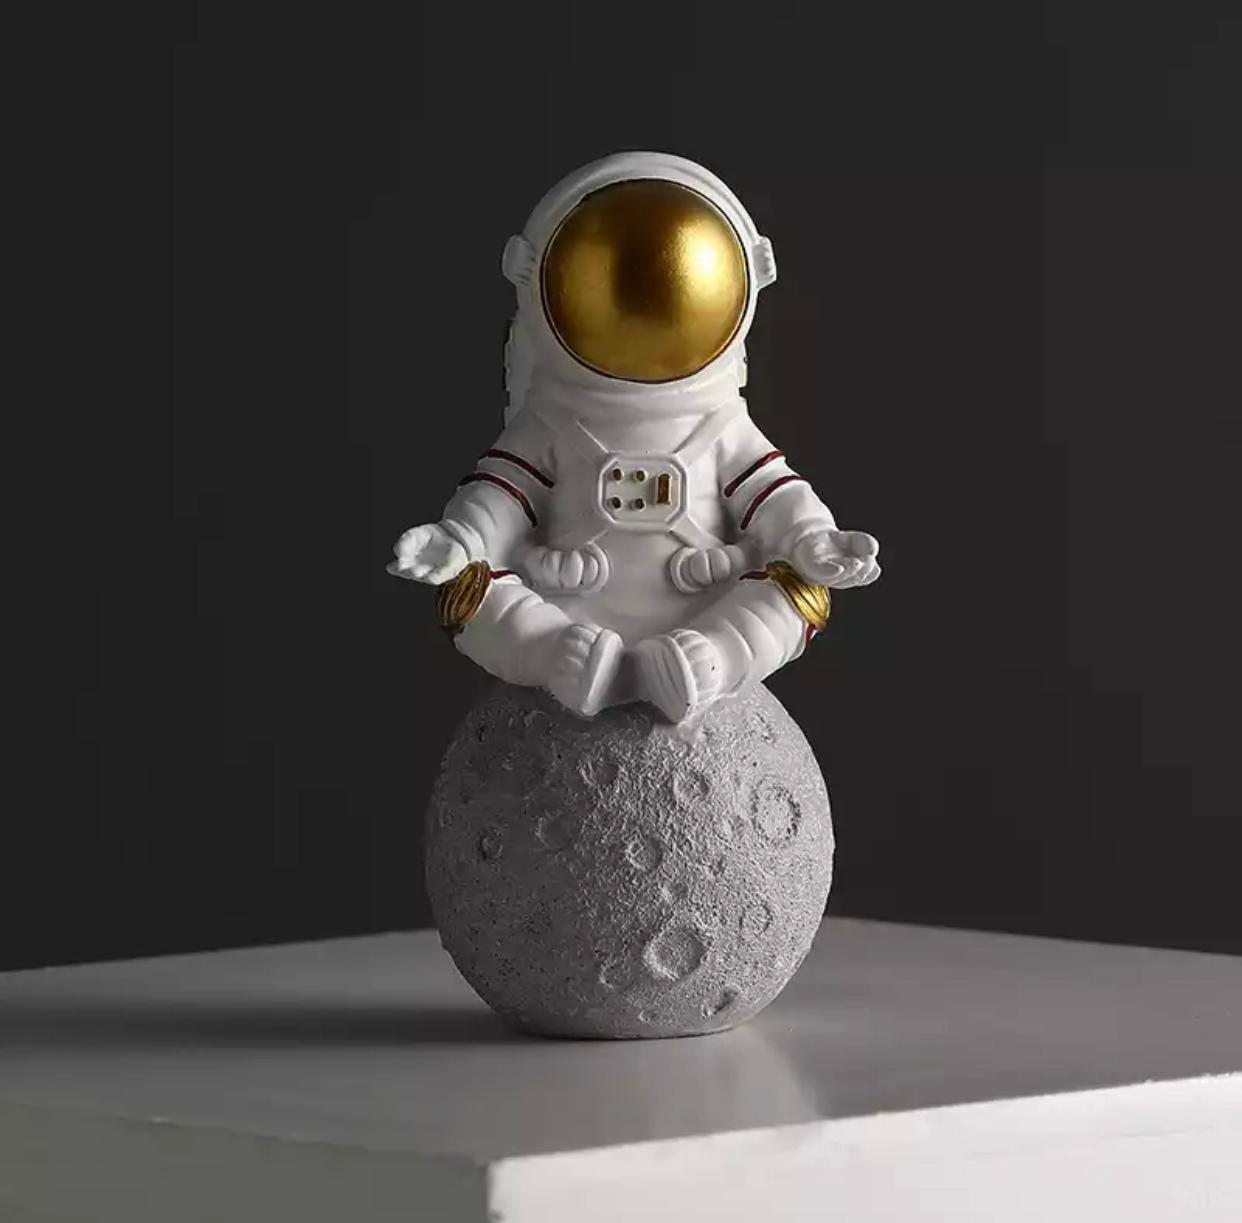 Estátua Nasa Astronauta Namaste Relax Yoga Na Lua - EV